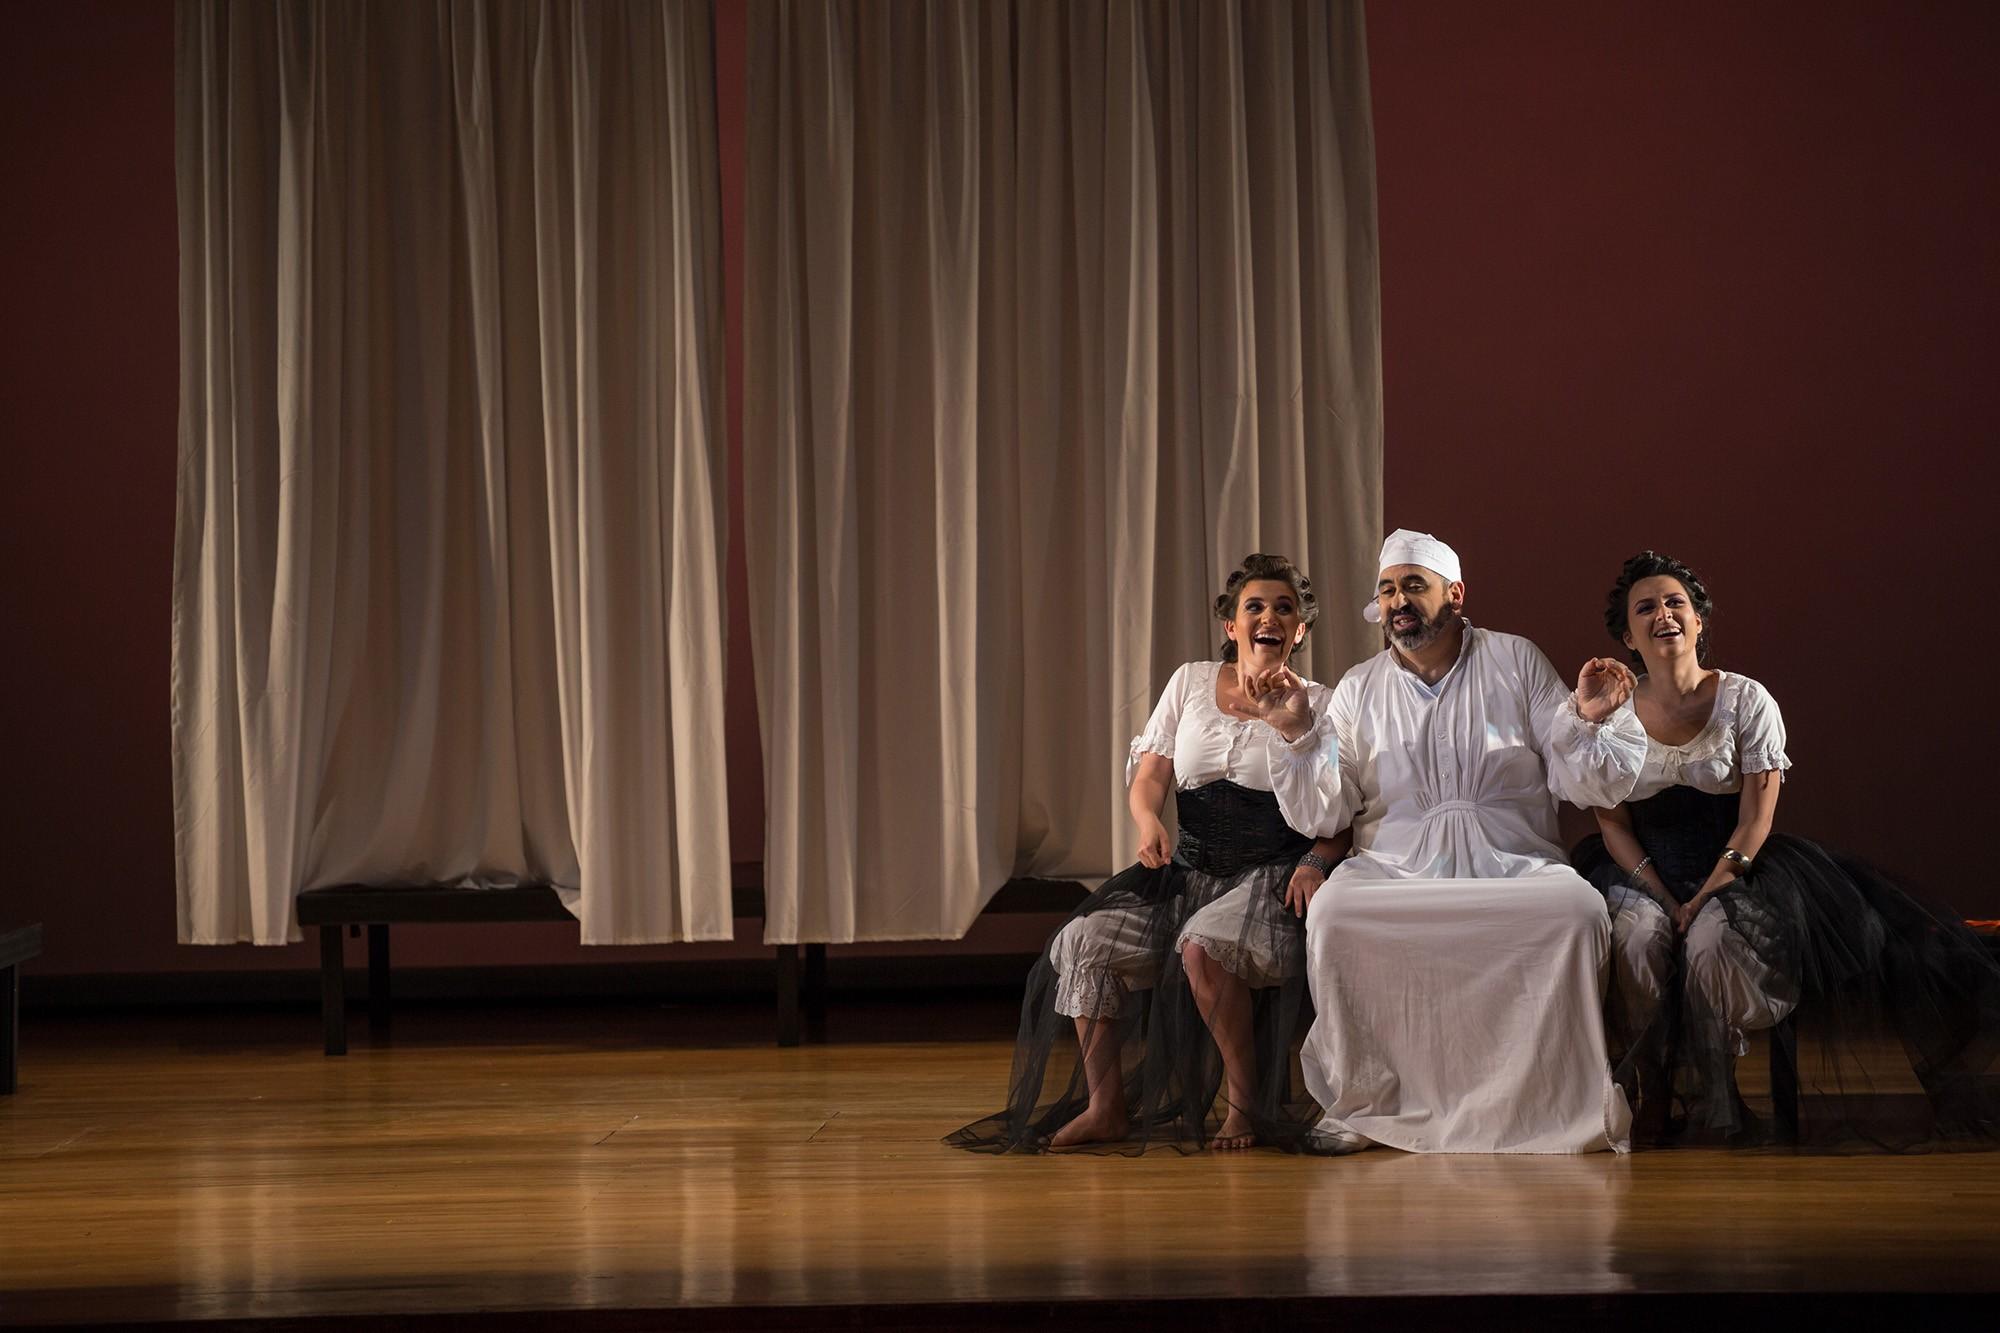 Cenerentola-Opera-directed-by-Jacopo-Spirei-4